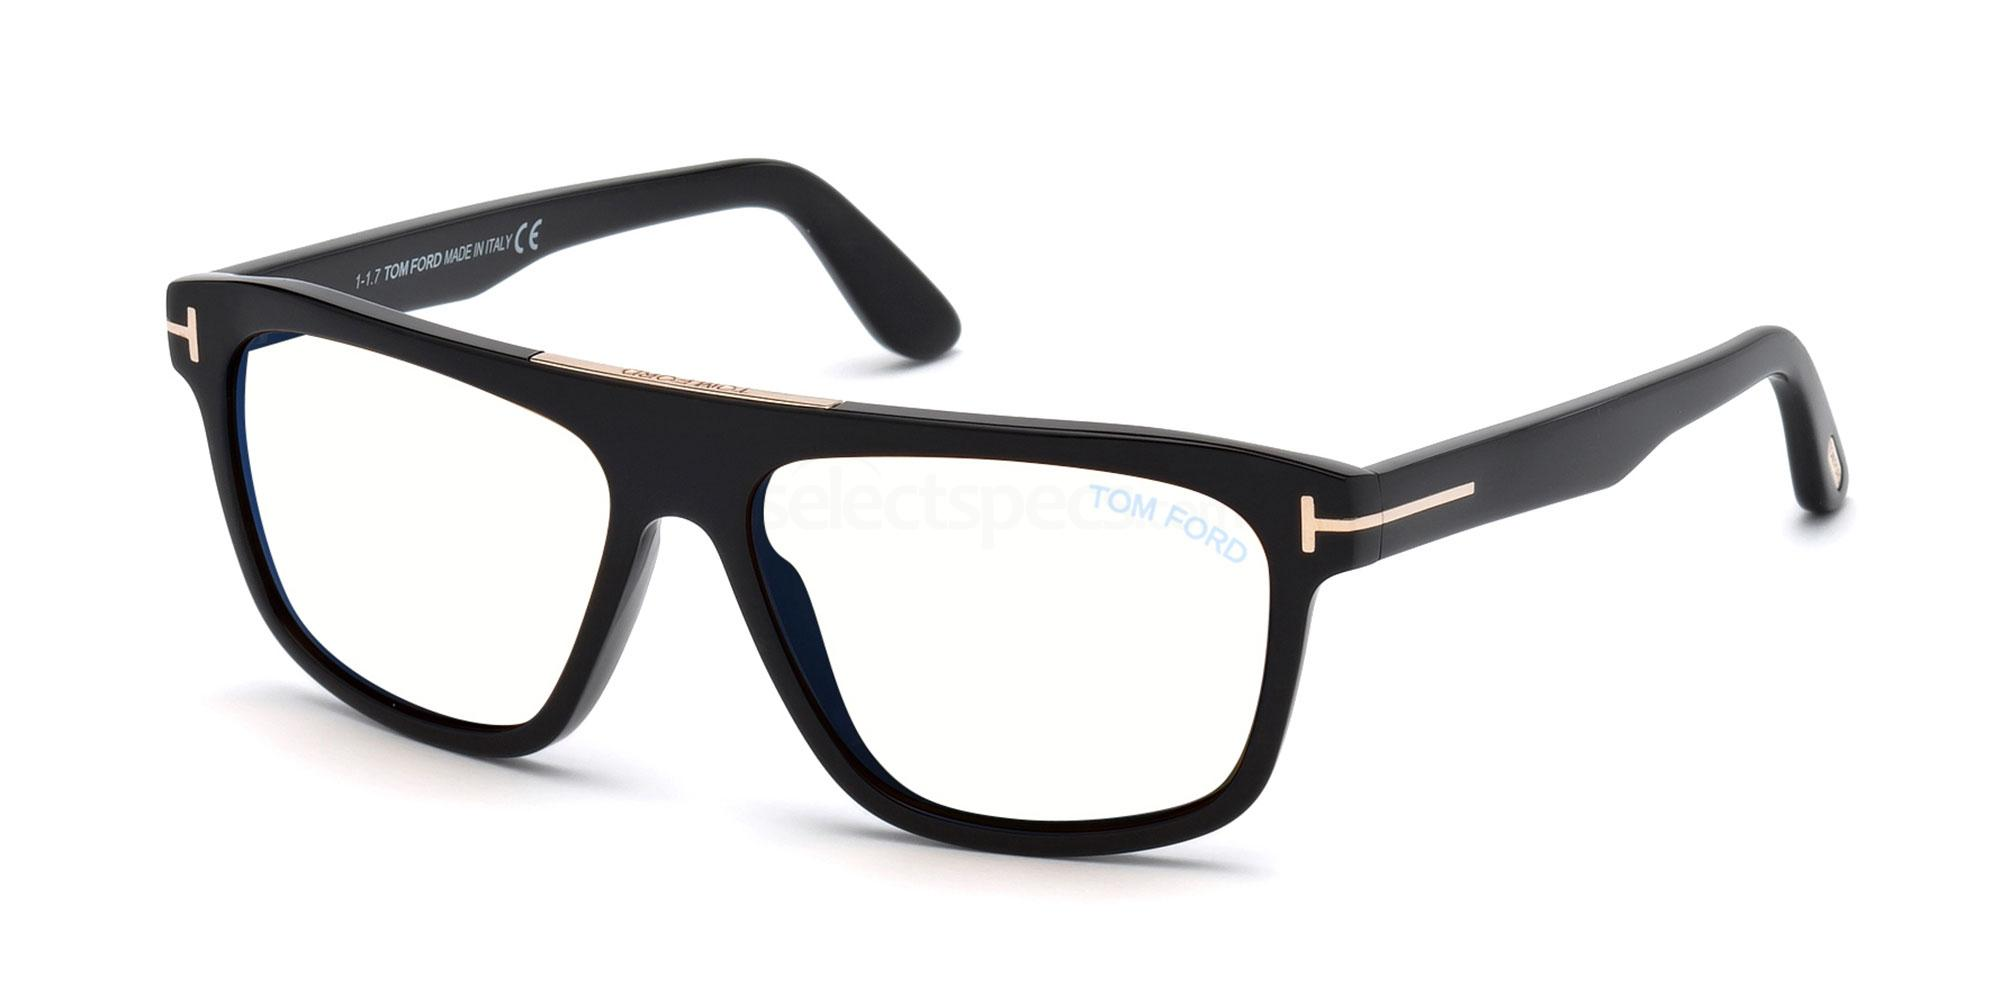 001 FT0628 Sunglasses, Tom Ford